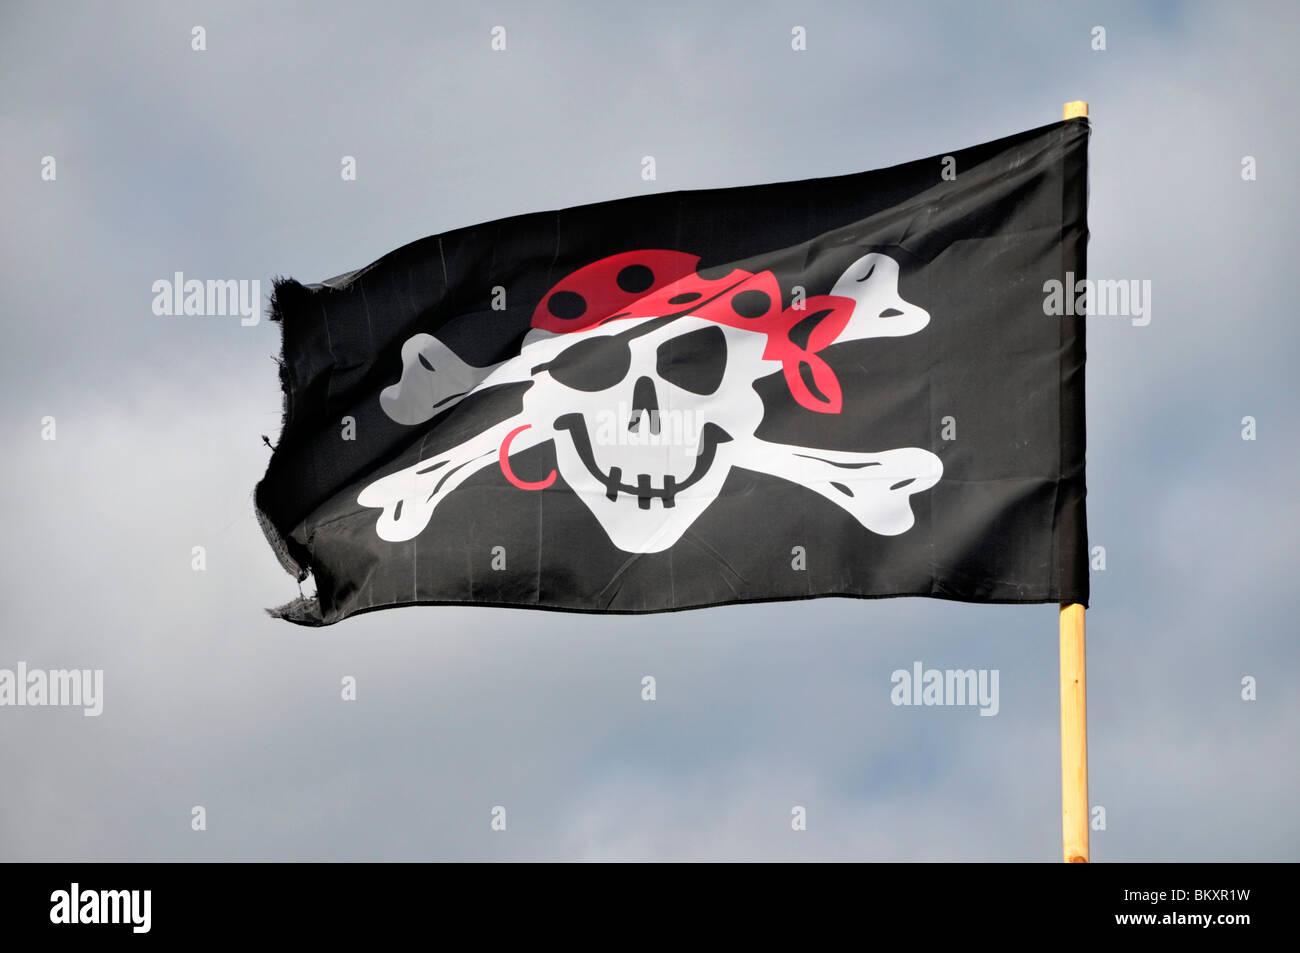 Pirate Stockfotos & Pirate Bilder - Alamy